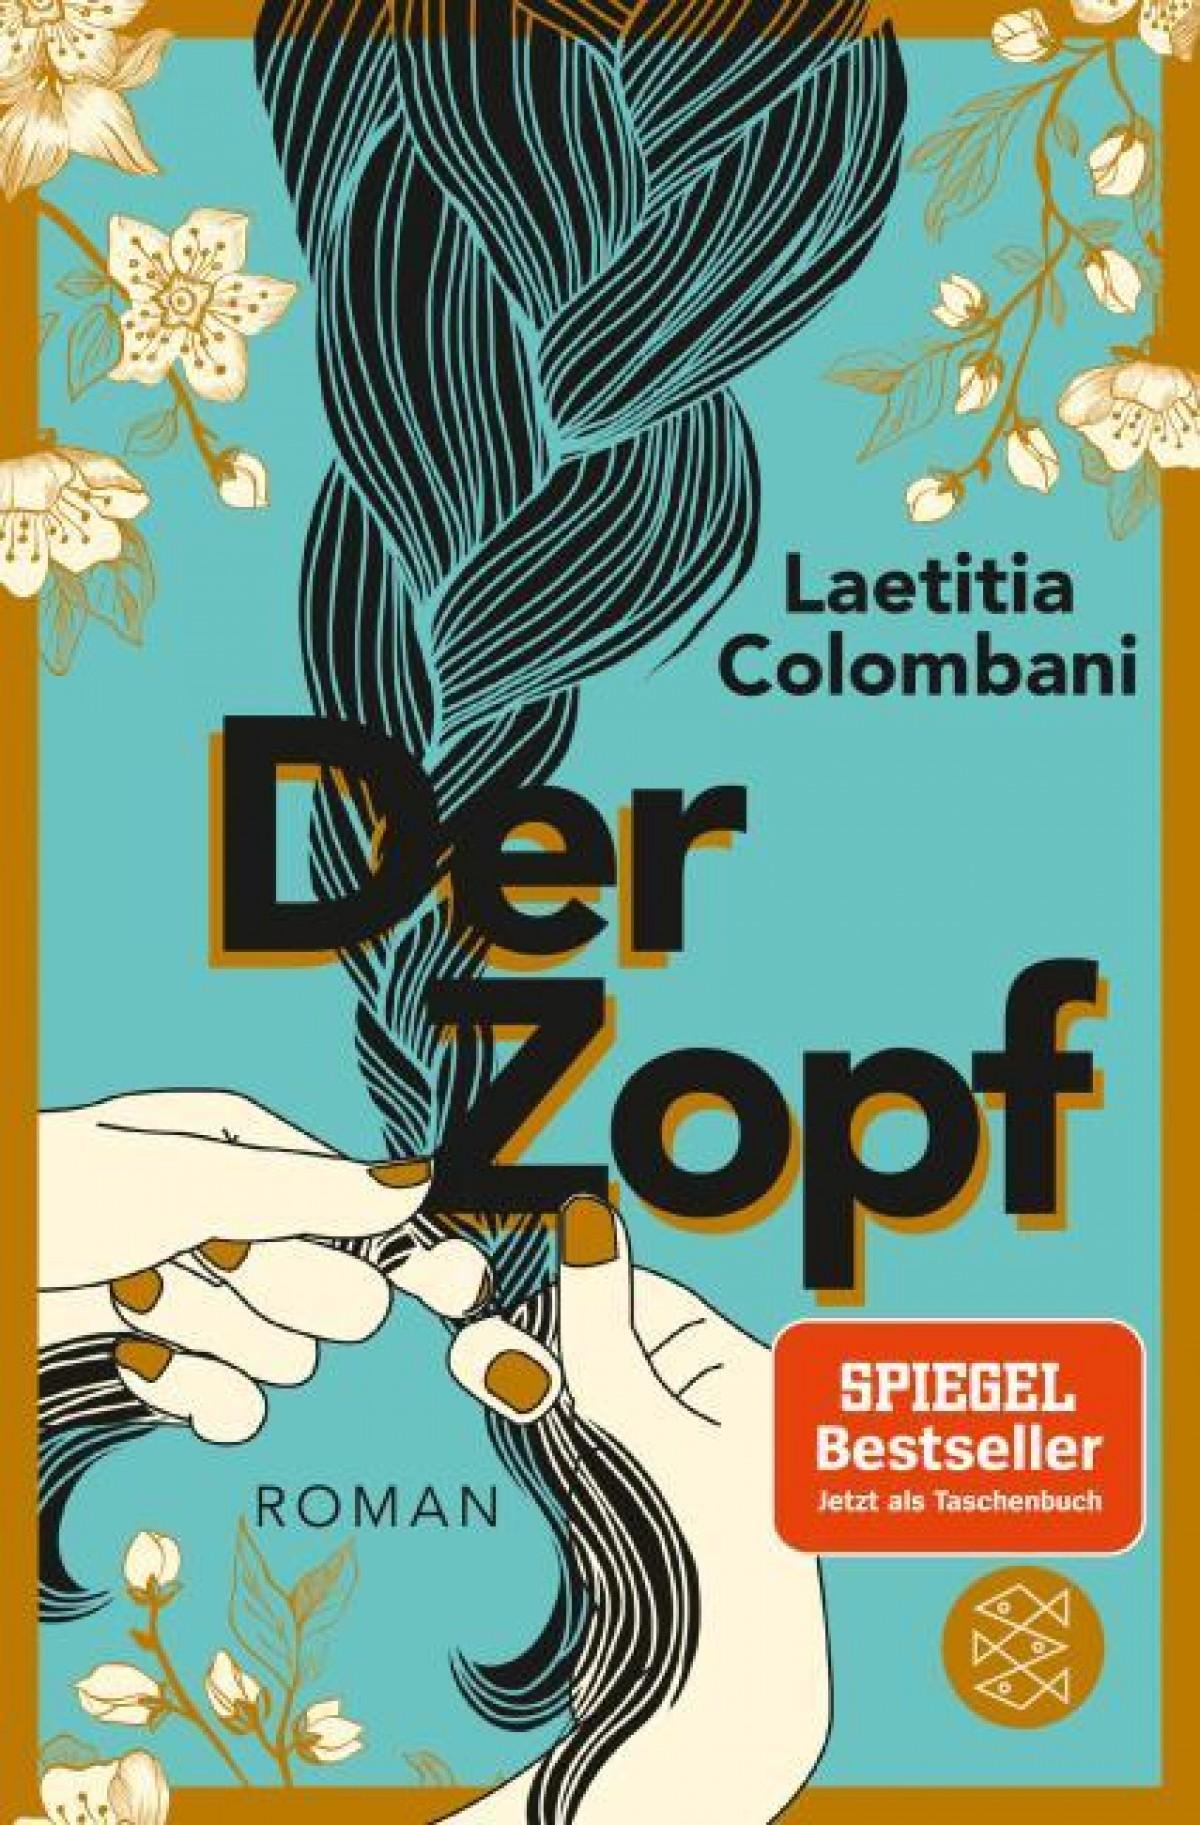 Buch Laetitia Colombani, Der Zopf